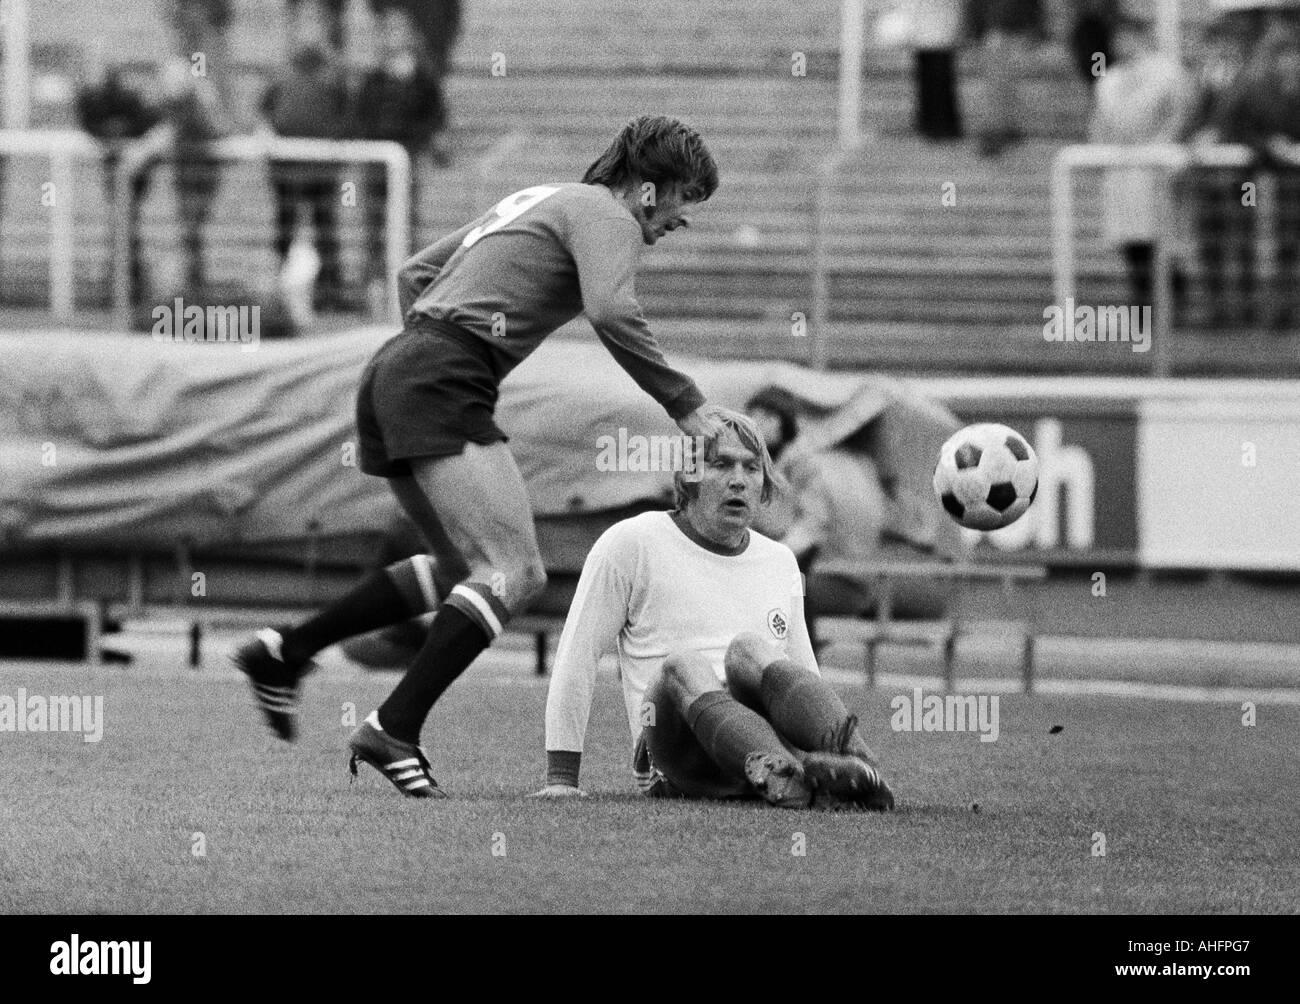 football, Bundesliga, 1972/1973, Rot-Weiss Oberhausen versus Eintracht Frankfurt 1:0, Niederrhein Stadium in Oberhausen, scene of the match, duel between Thomas Parits (Frankfurt) left and Lothar Kobluhn (RWO) - Stock Image